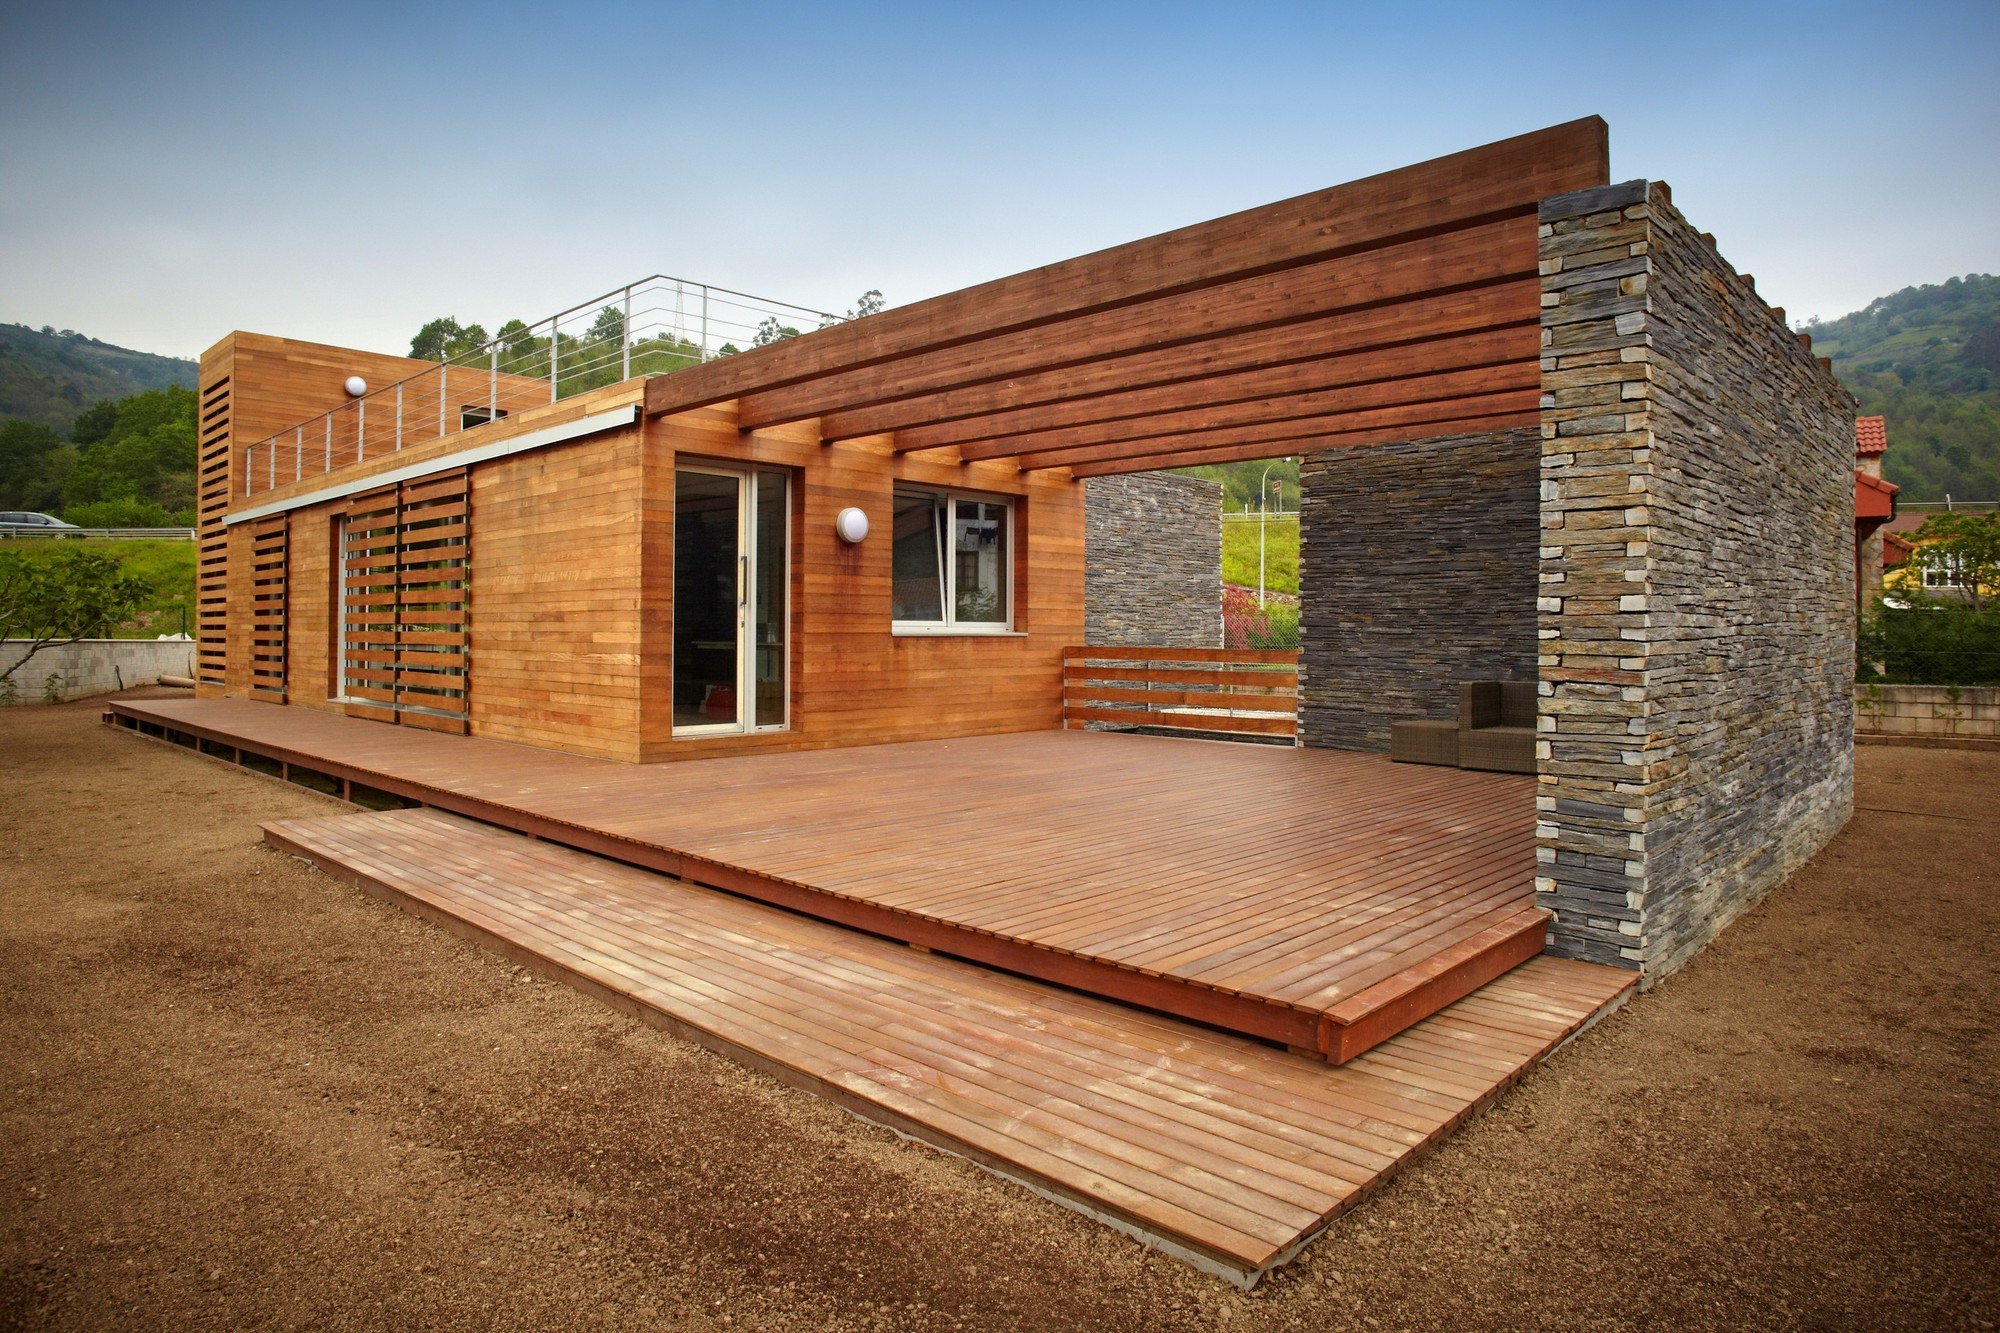 Family House In Pereda / Zwei Estudio Creativo, © Javier Granda